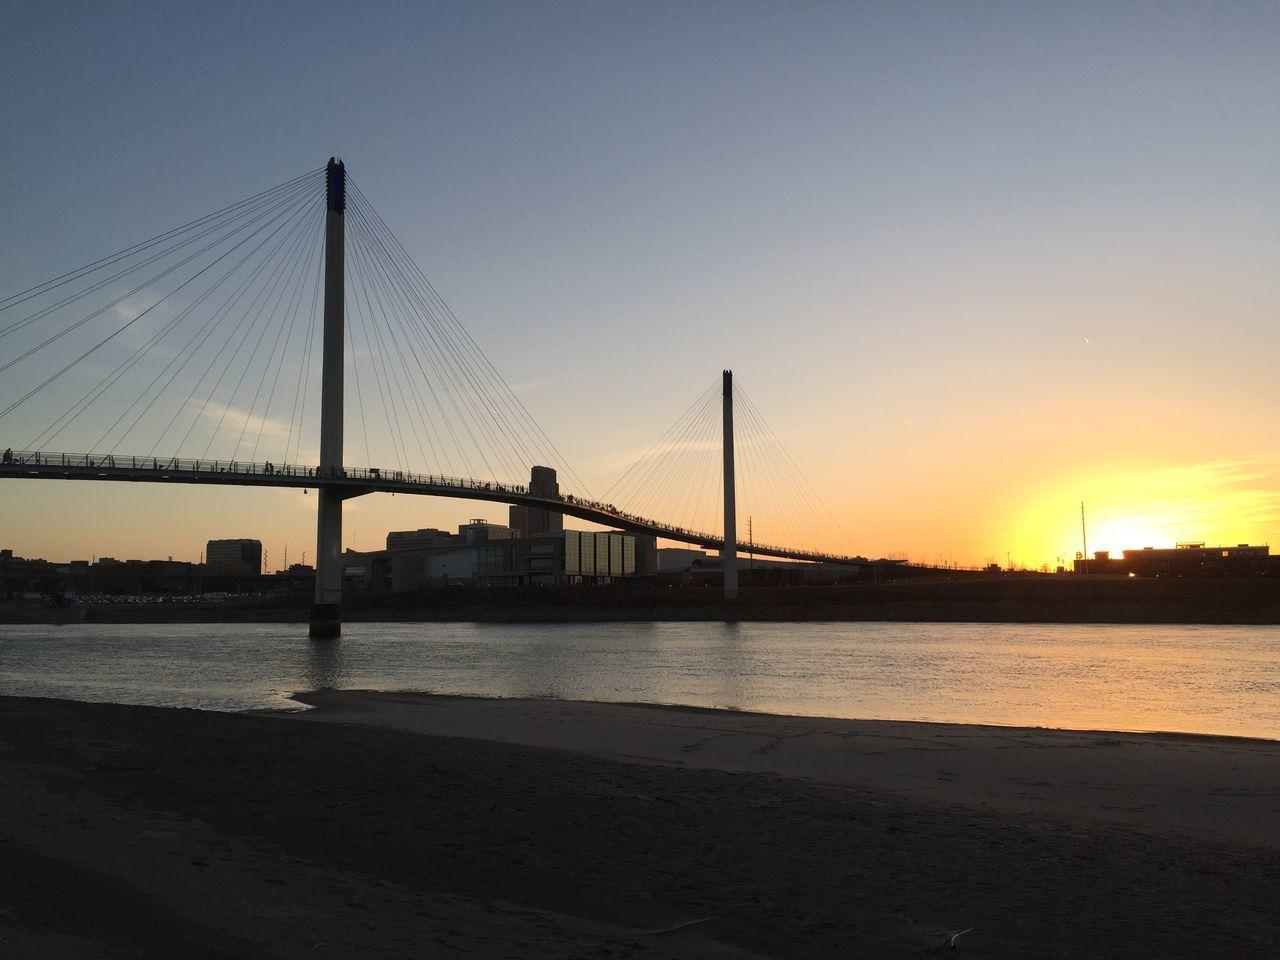 Footbridge Over River During Sunset